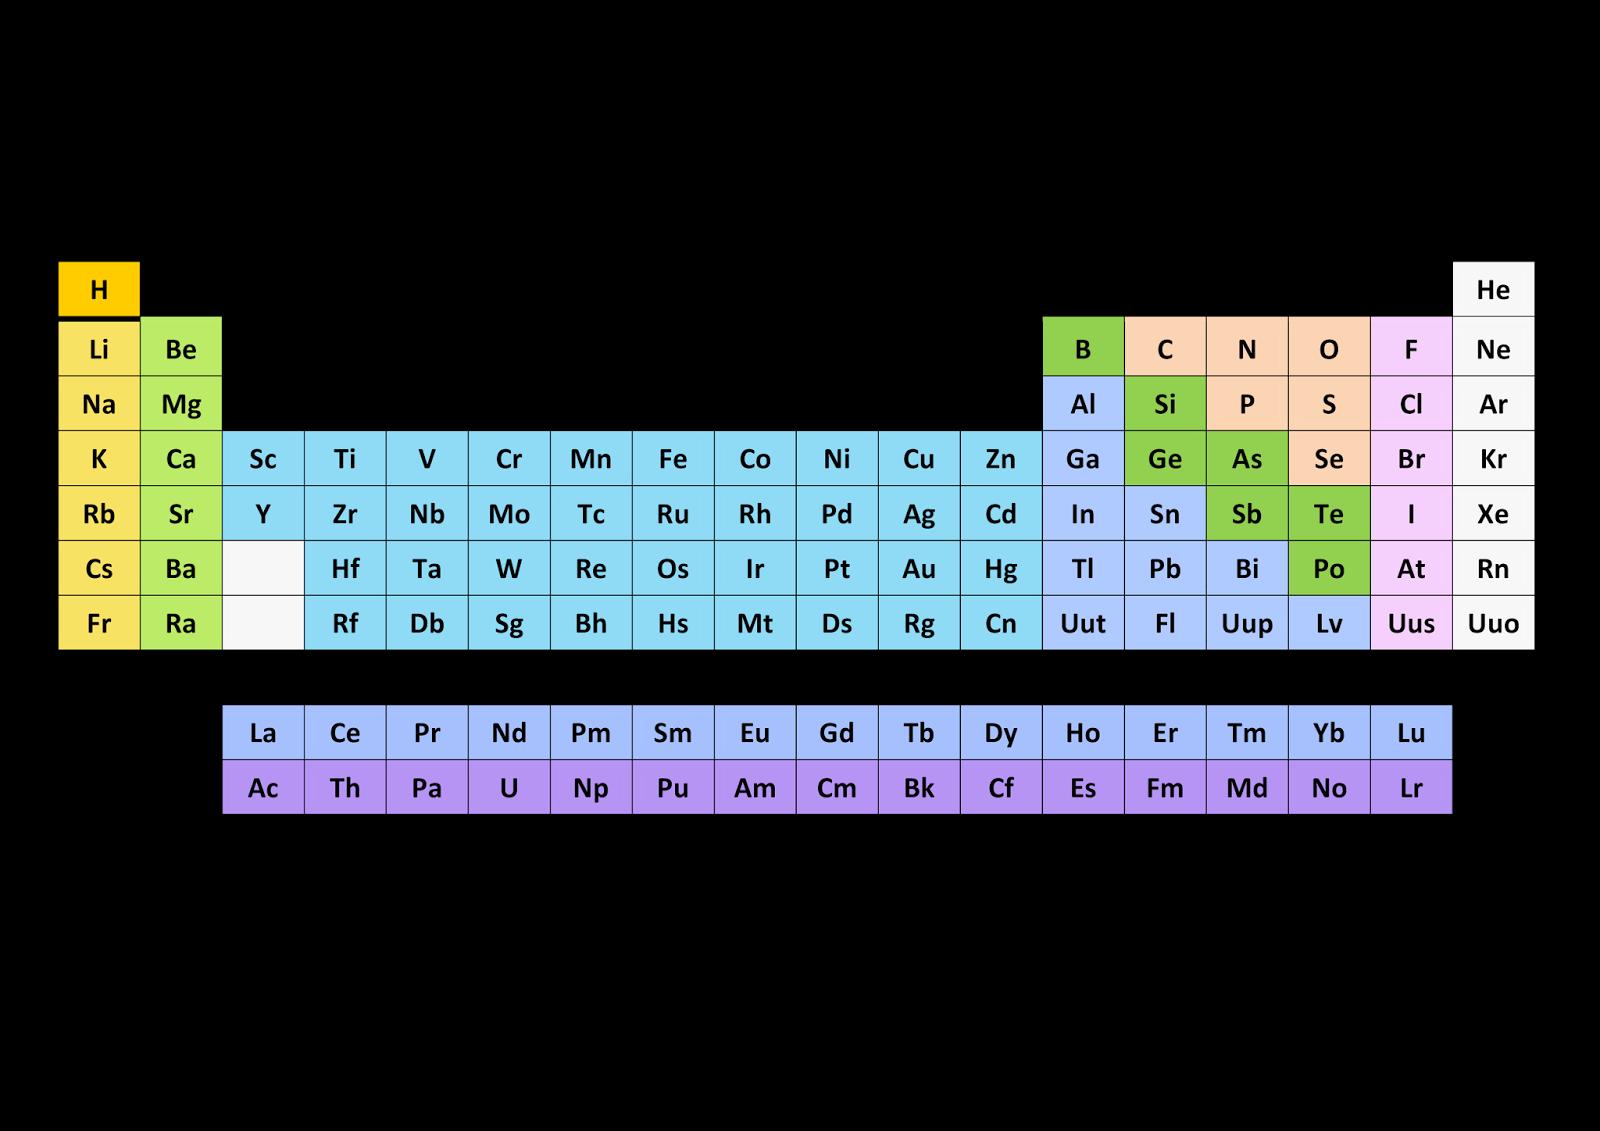 Cursos de computacin 2014 2015 tabla peridica de los elementos httpsdrivegooglefolderviewid0b5g1knd4zrxfyzhpvkiytxjotw8uspsharing urtaz Images